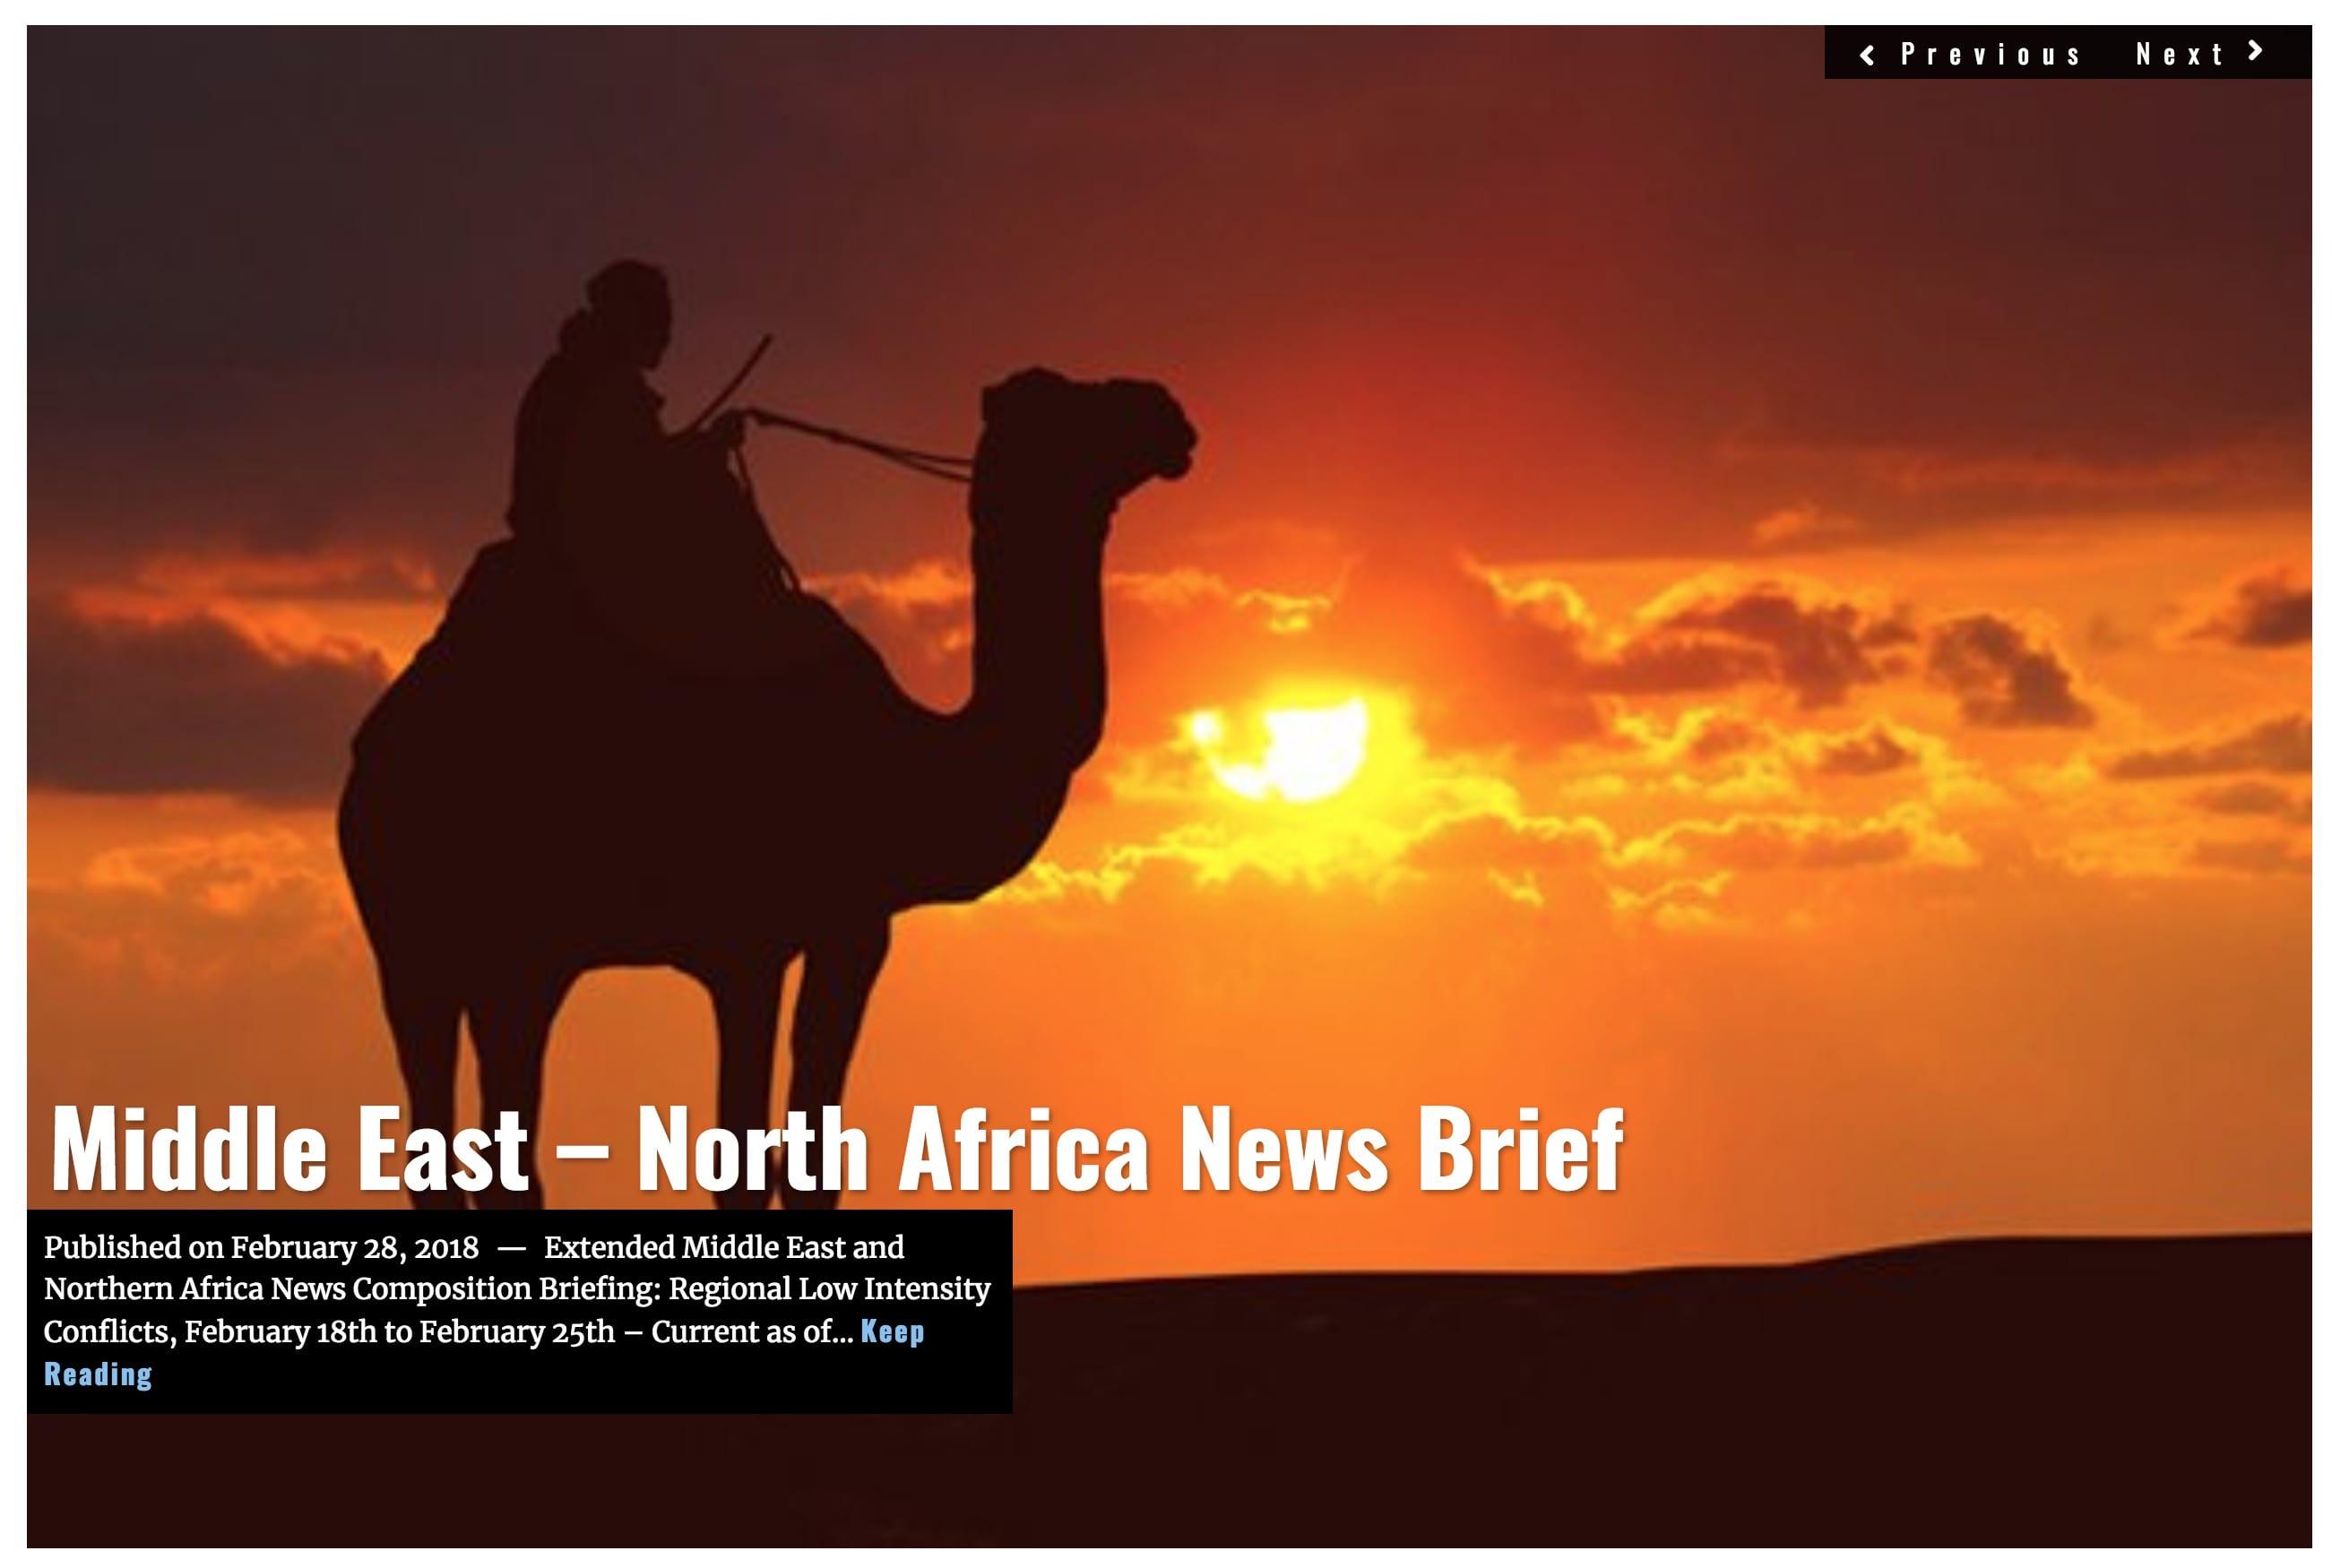 Image Lima Charlie News Headline MENA Feb 28 2018